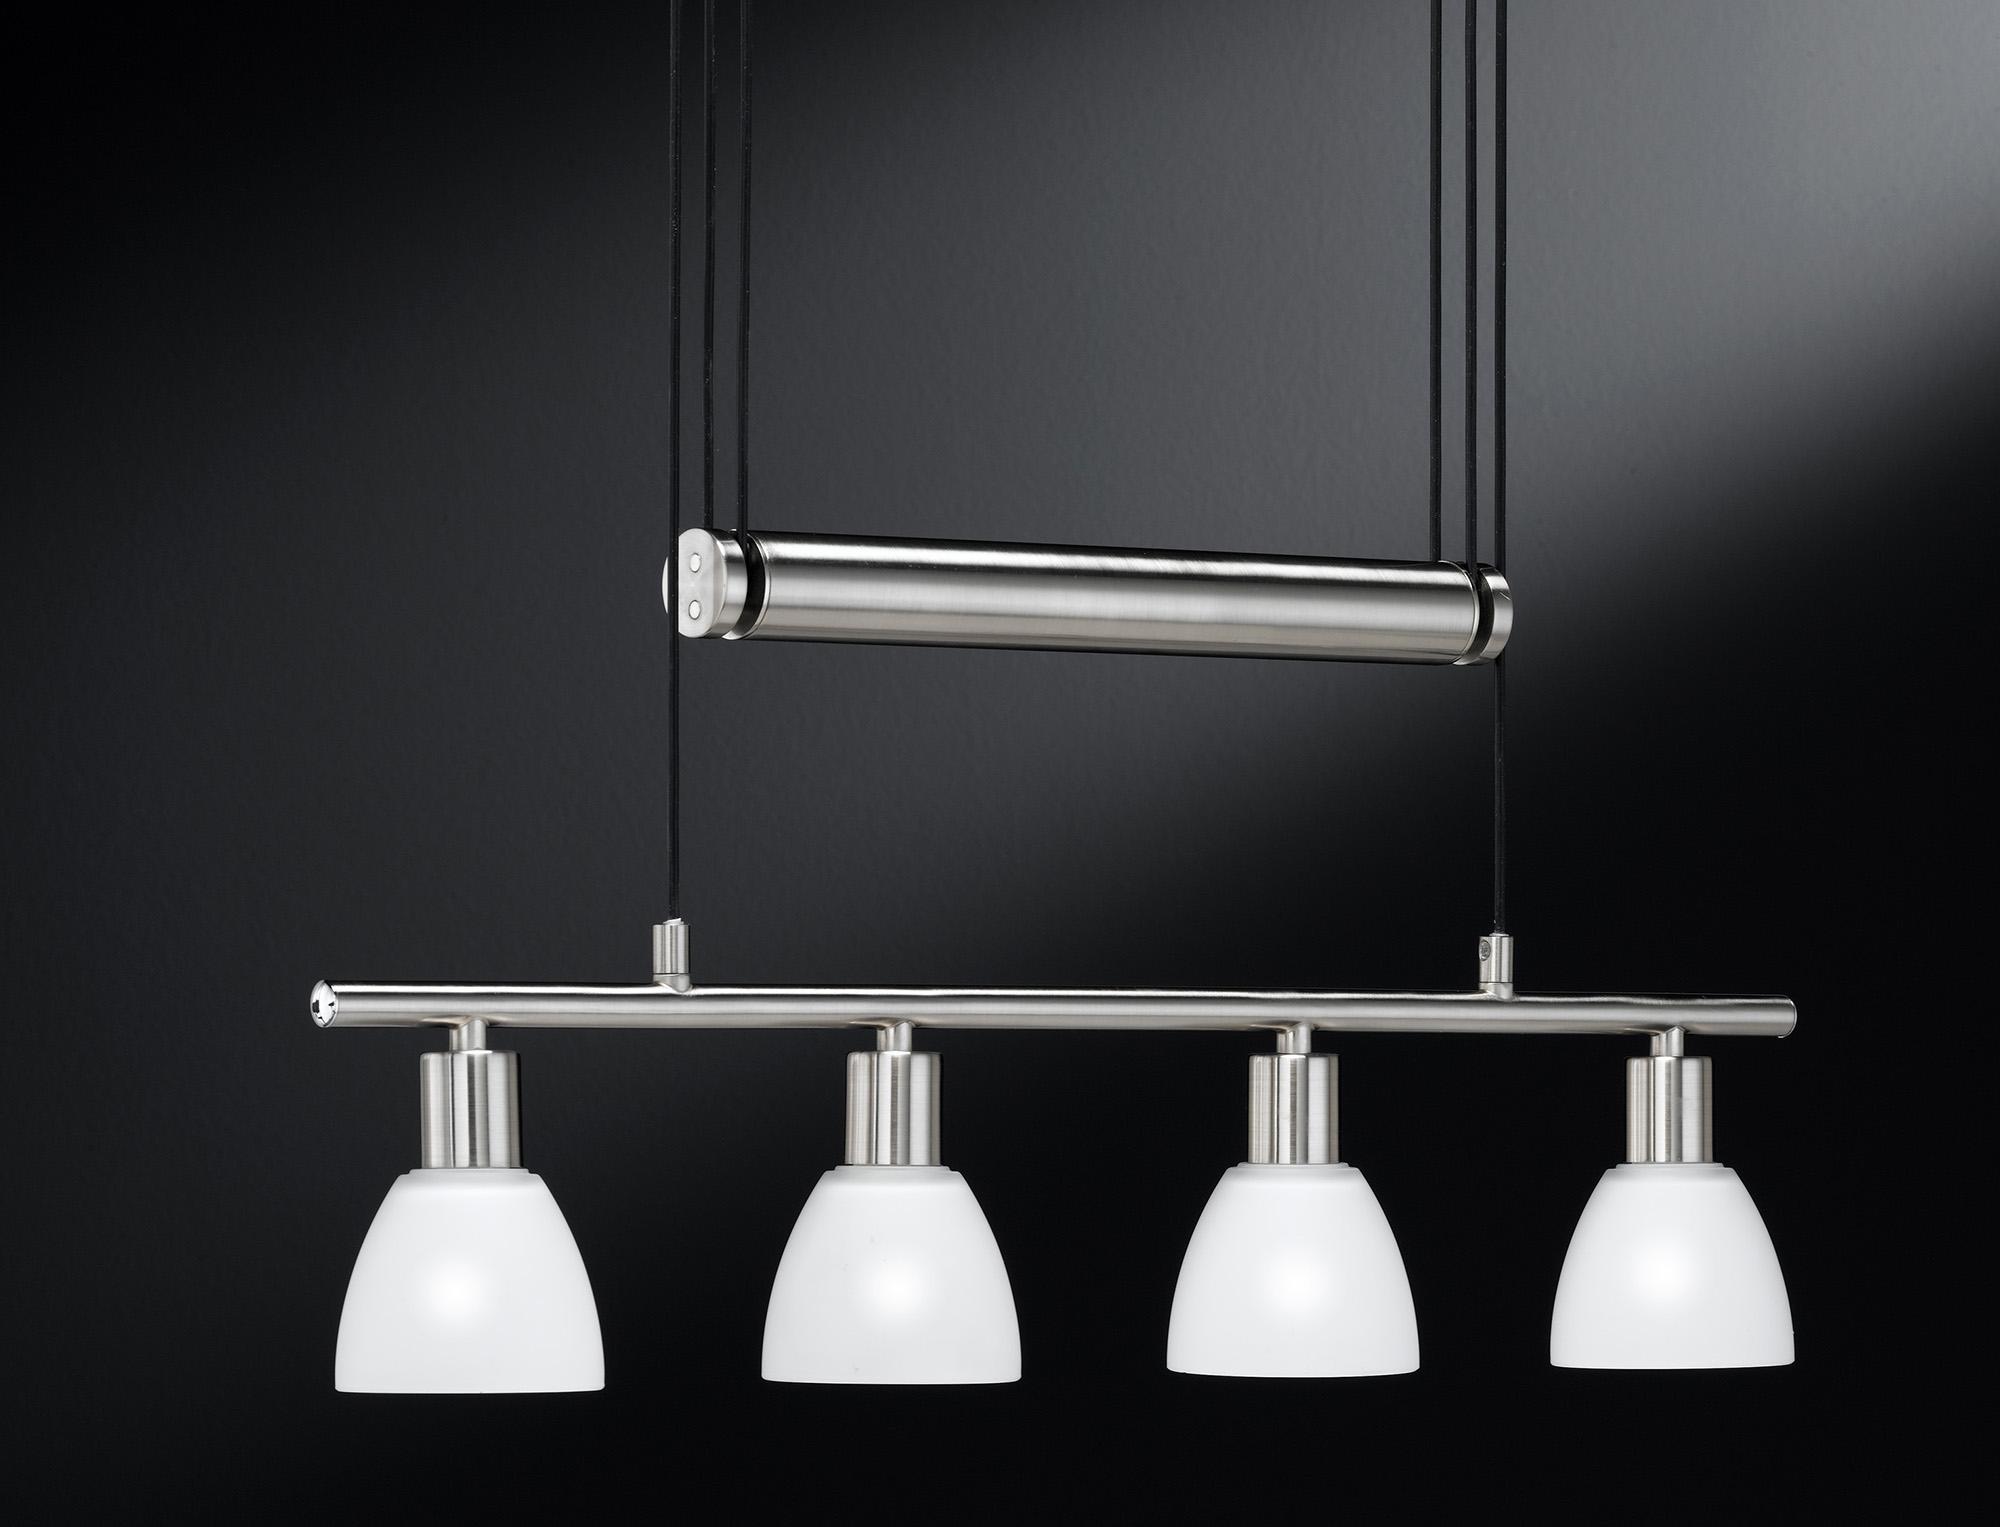 Люстра на четыре лампы в стиле модерн